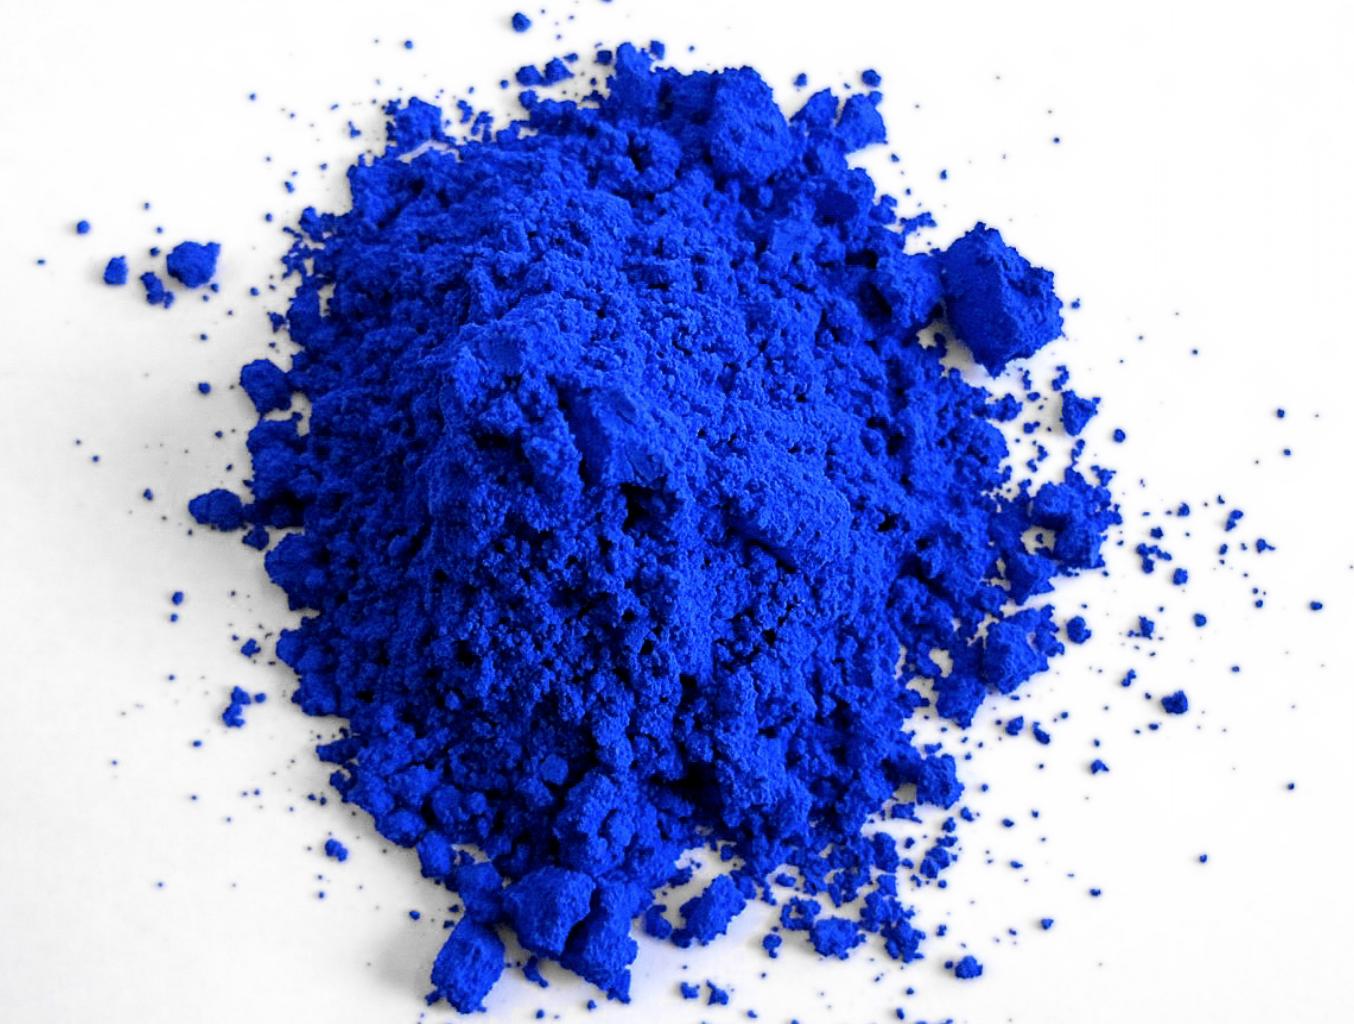 YLnMn Blue pigment